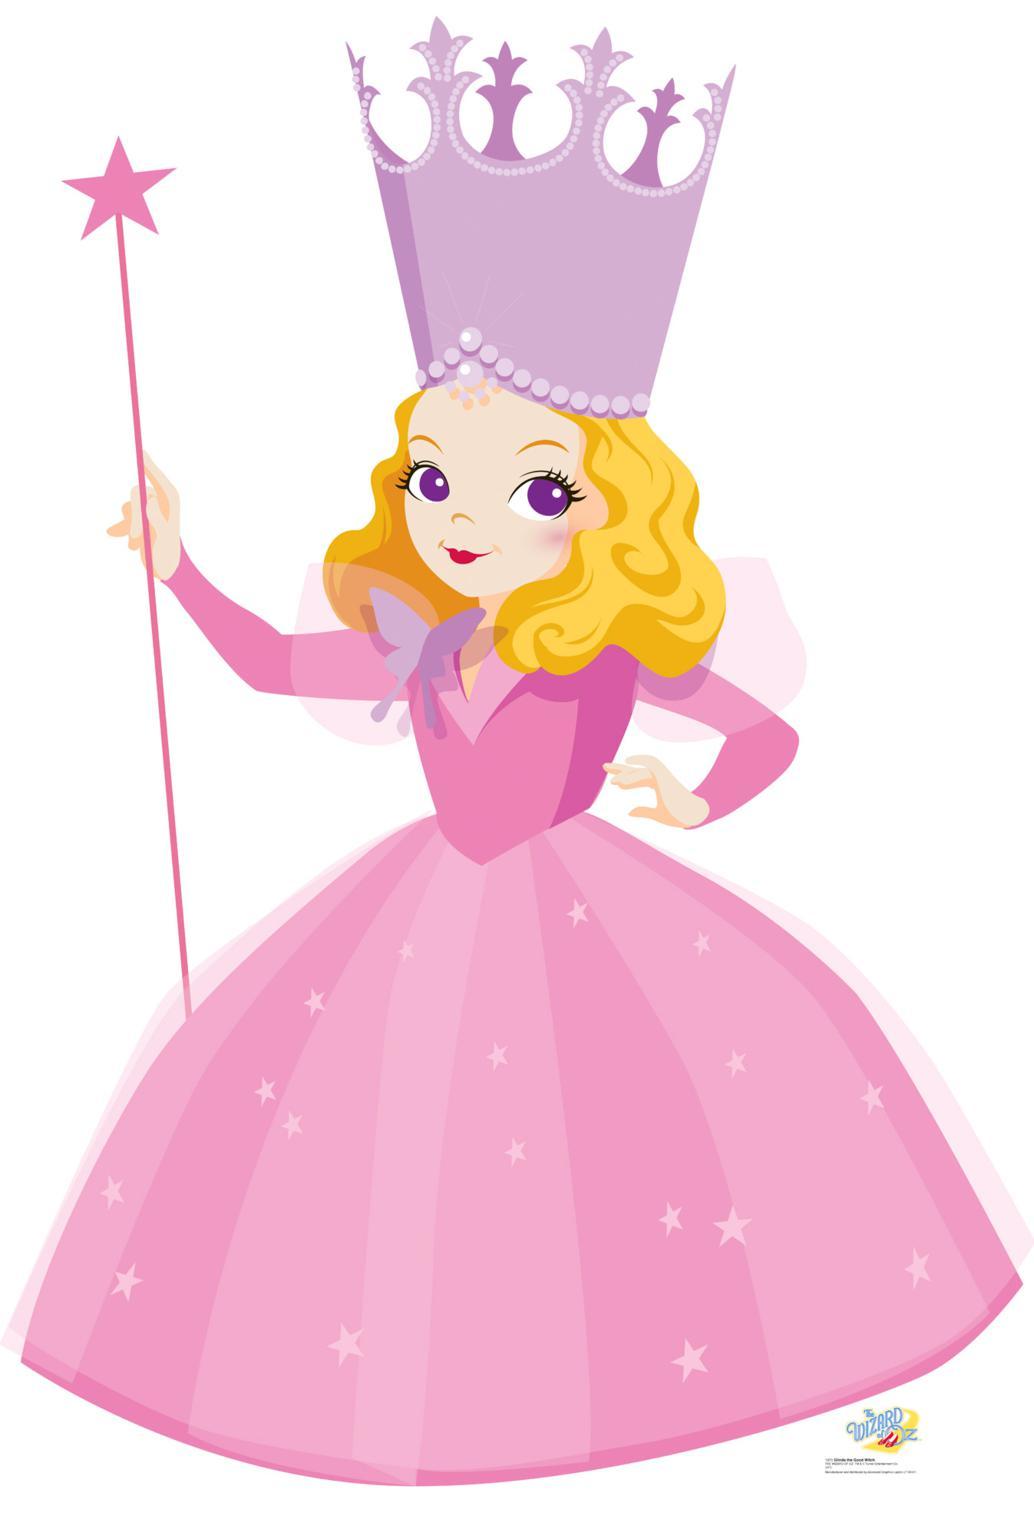 Wizard Of Oz clipart glenda Clipart Witch Witch Glenda Clipart